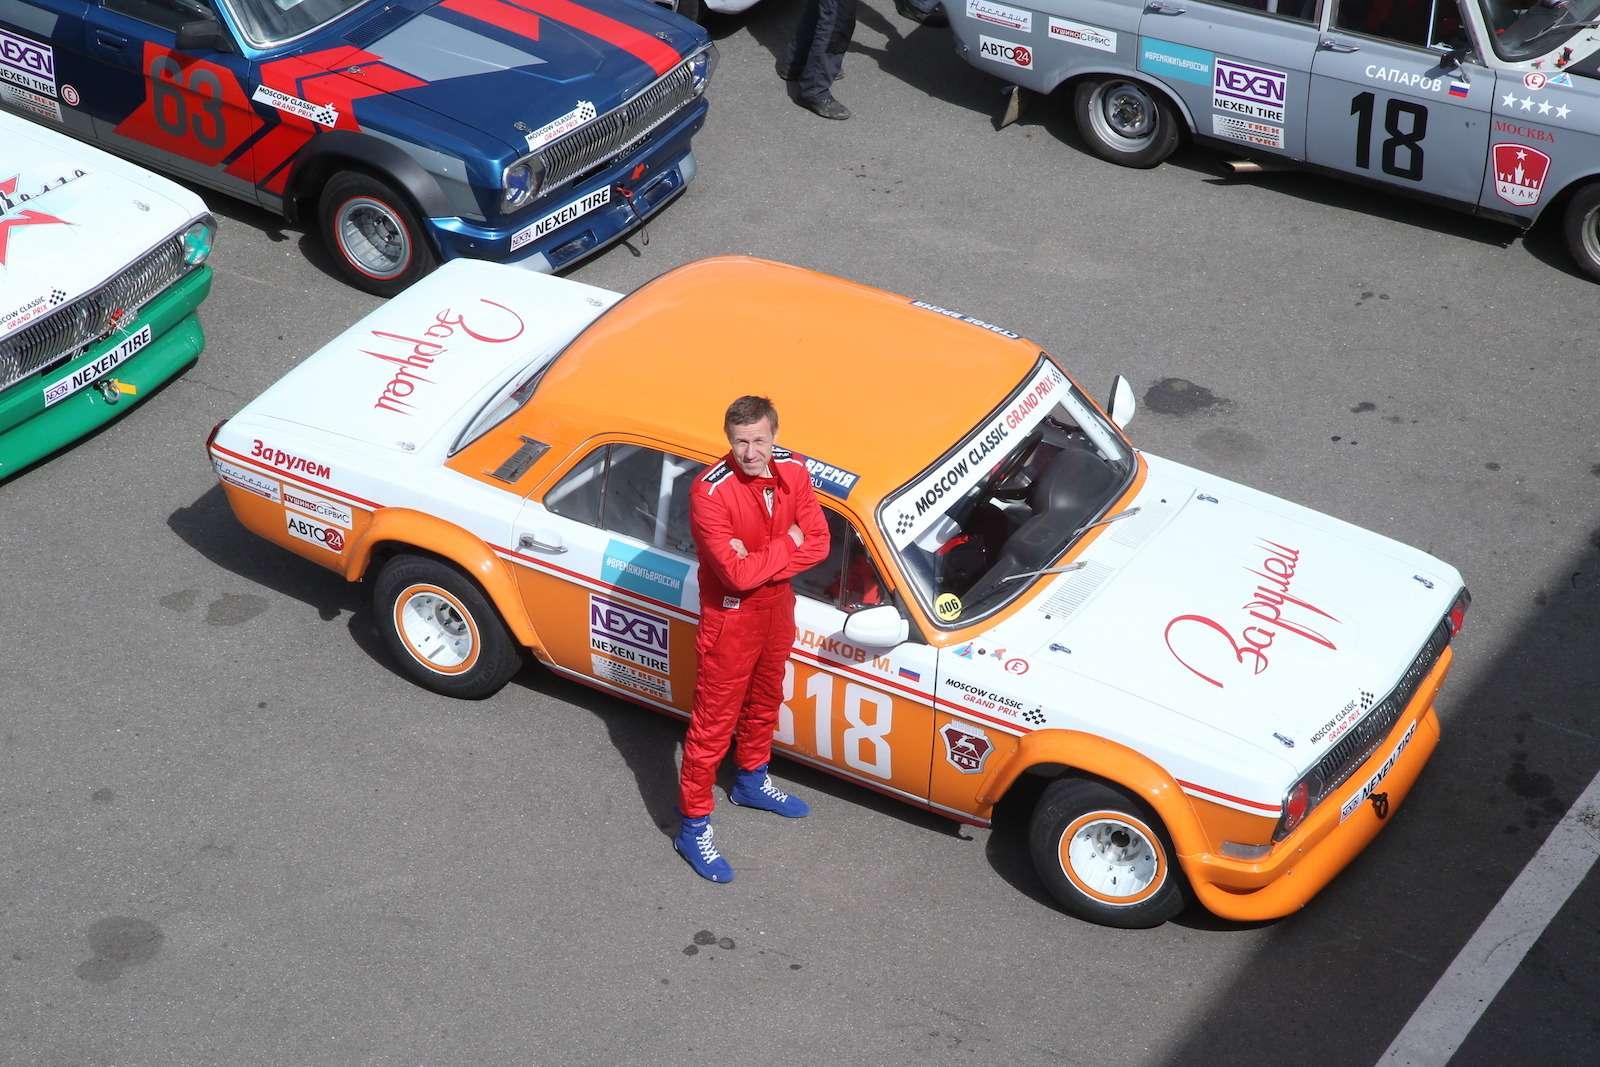 Болид ГАЗ-24«Зарулем» наMoscow Classiс Grand Prix— фото 608341